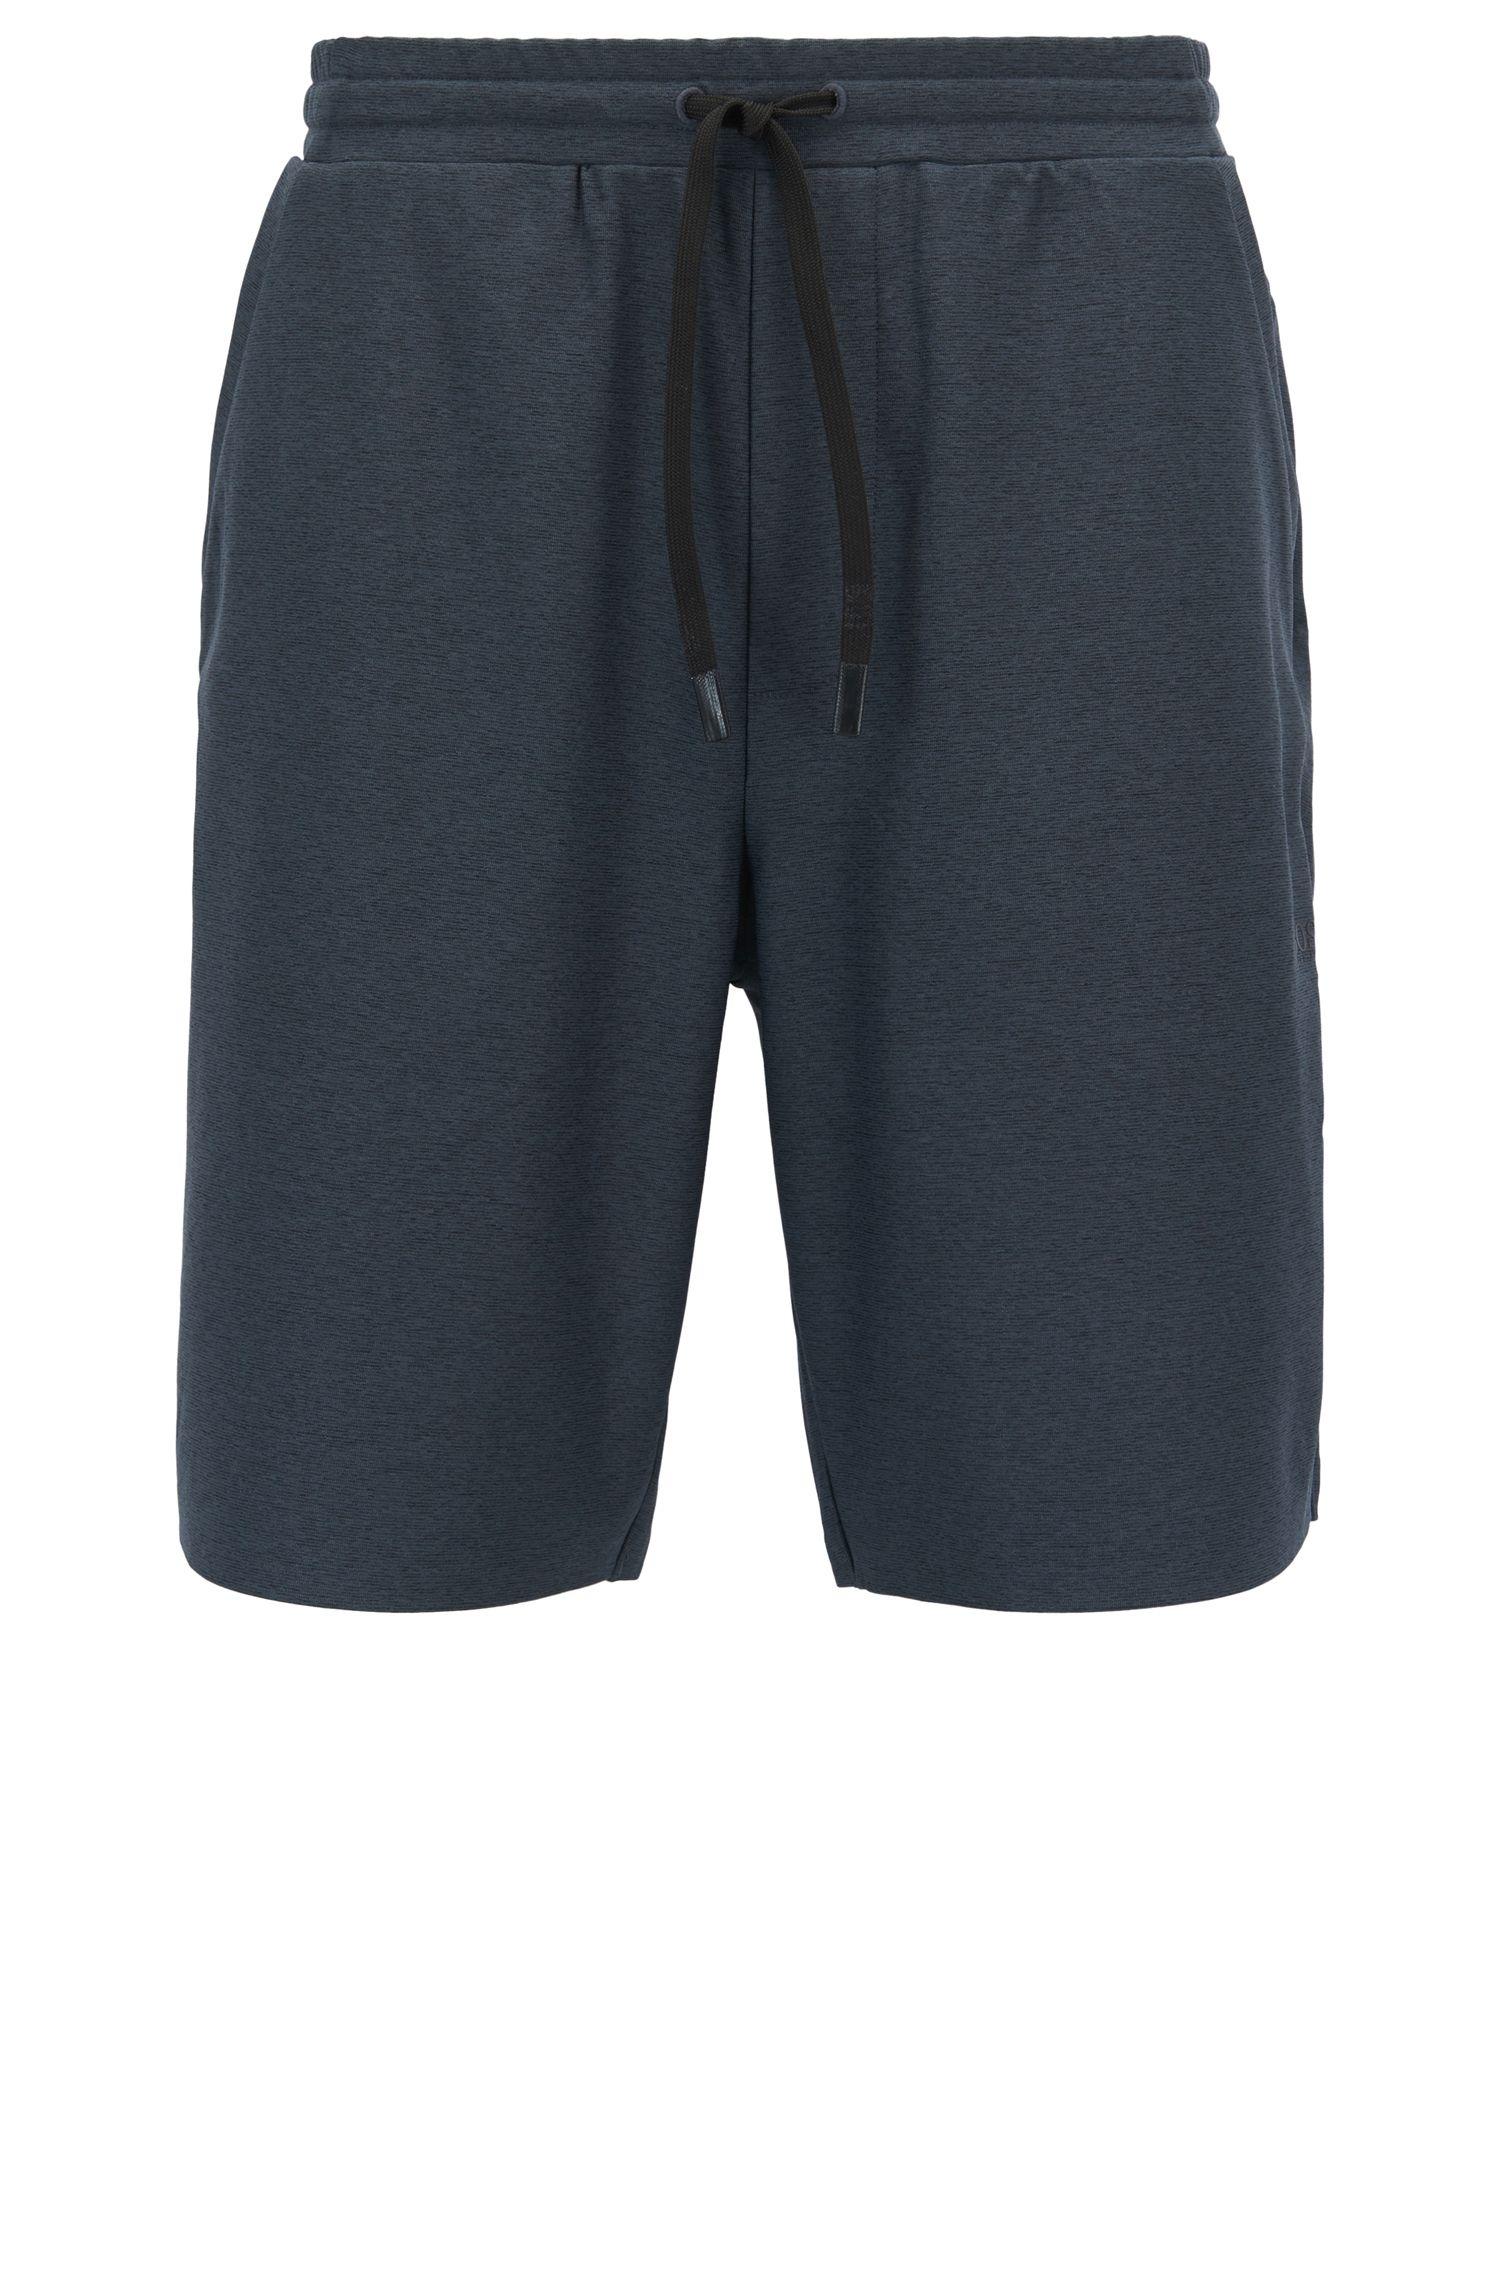 Stretch Jersey Short | Headlo